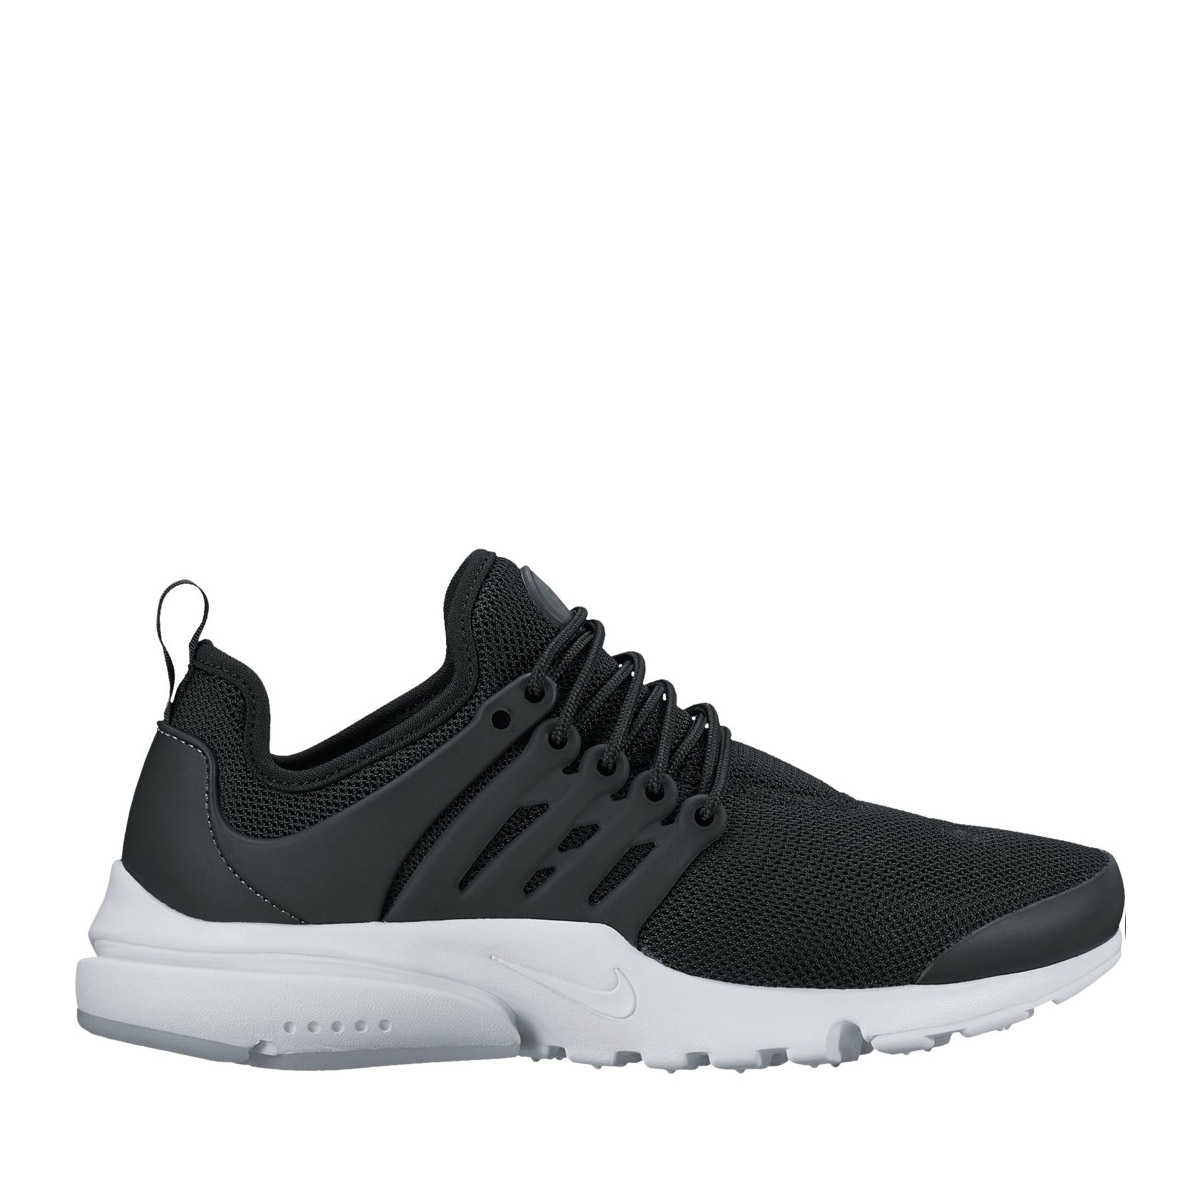 premium selection d919e cb1ee NIKE WMNS AIR PRESTO ULTRA BR (Nike women air presto ultra BR)  BLACK/BLACK-WHITE-GLACIER BLUE 17SU-I